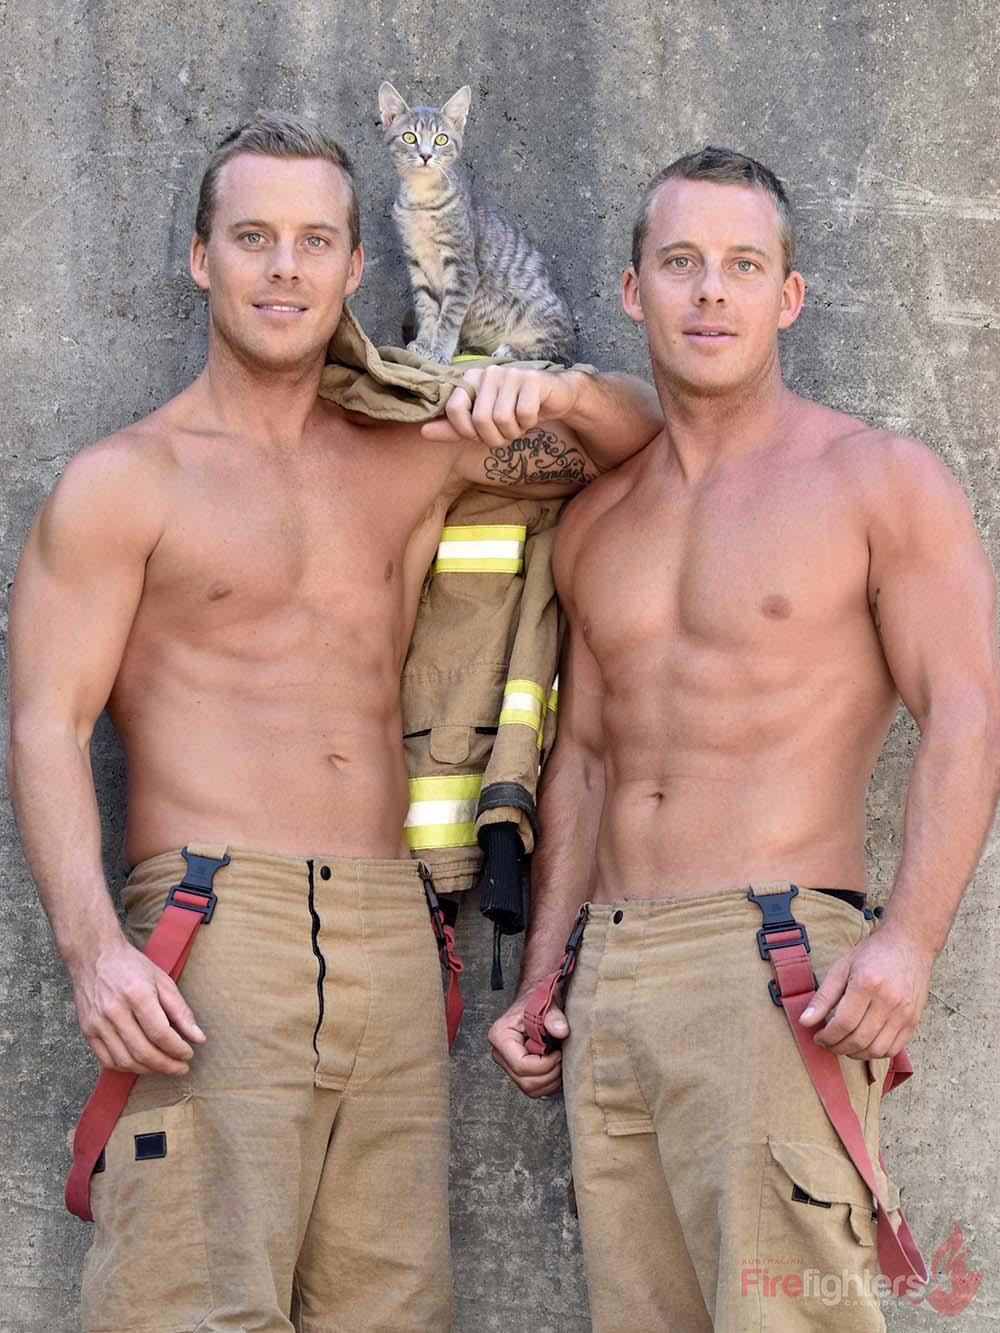 bomberos australianos calendario 2019 - 10